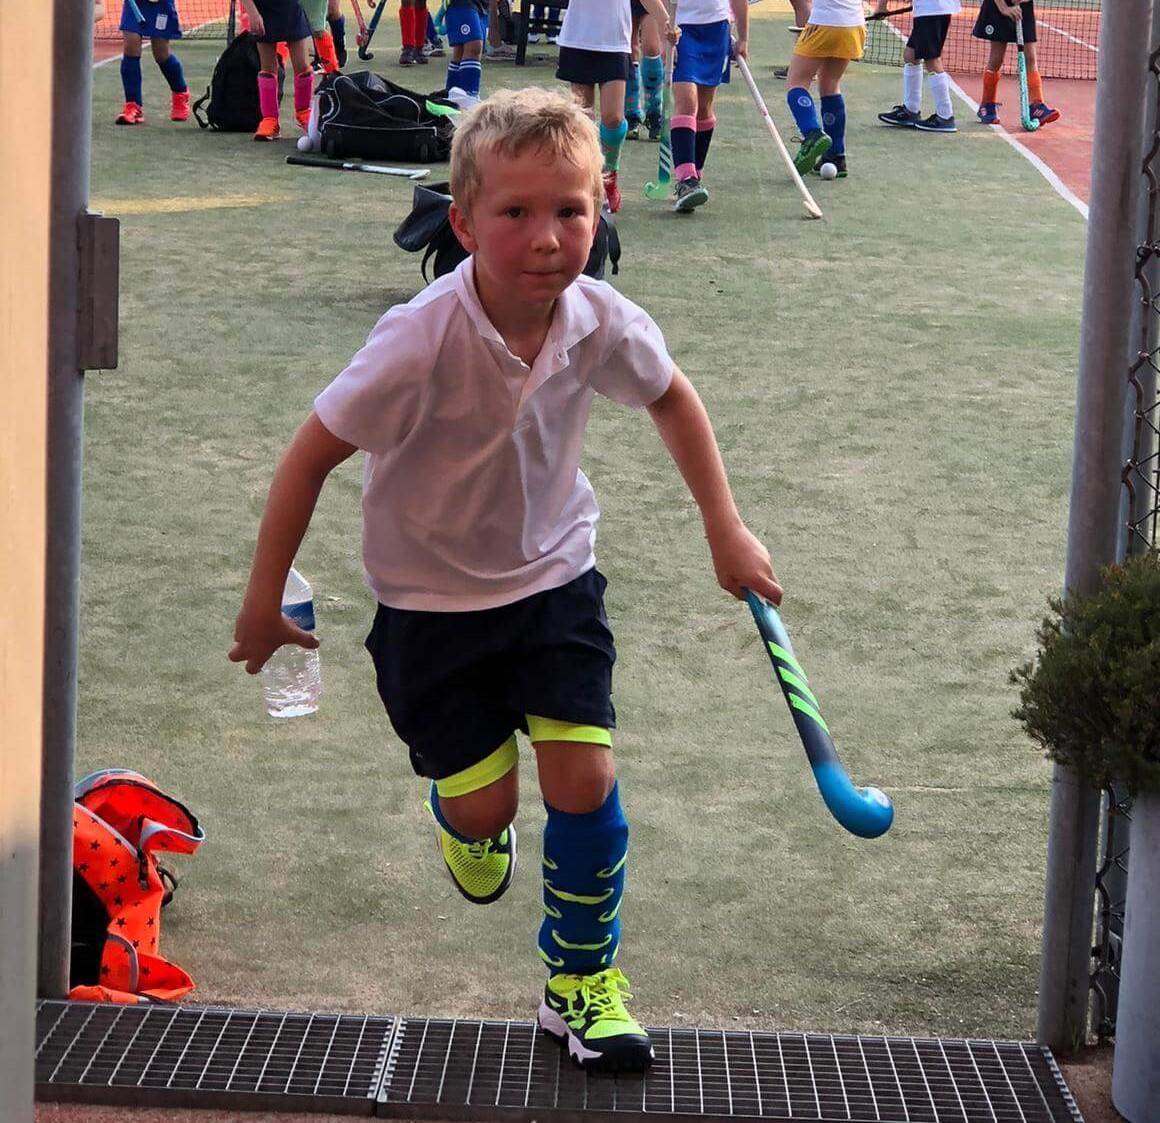 hockey, les, sportles, training, HC Diemen, Diemen